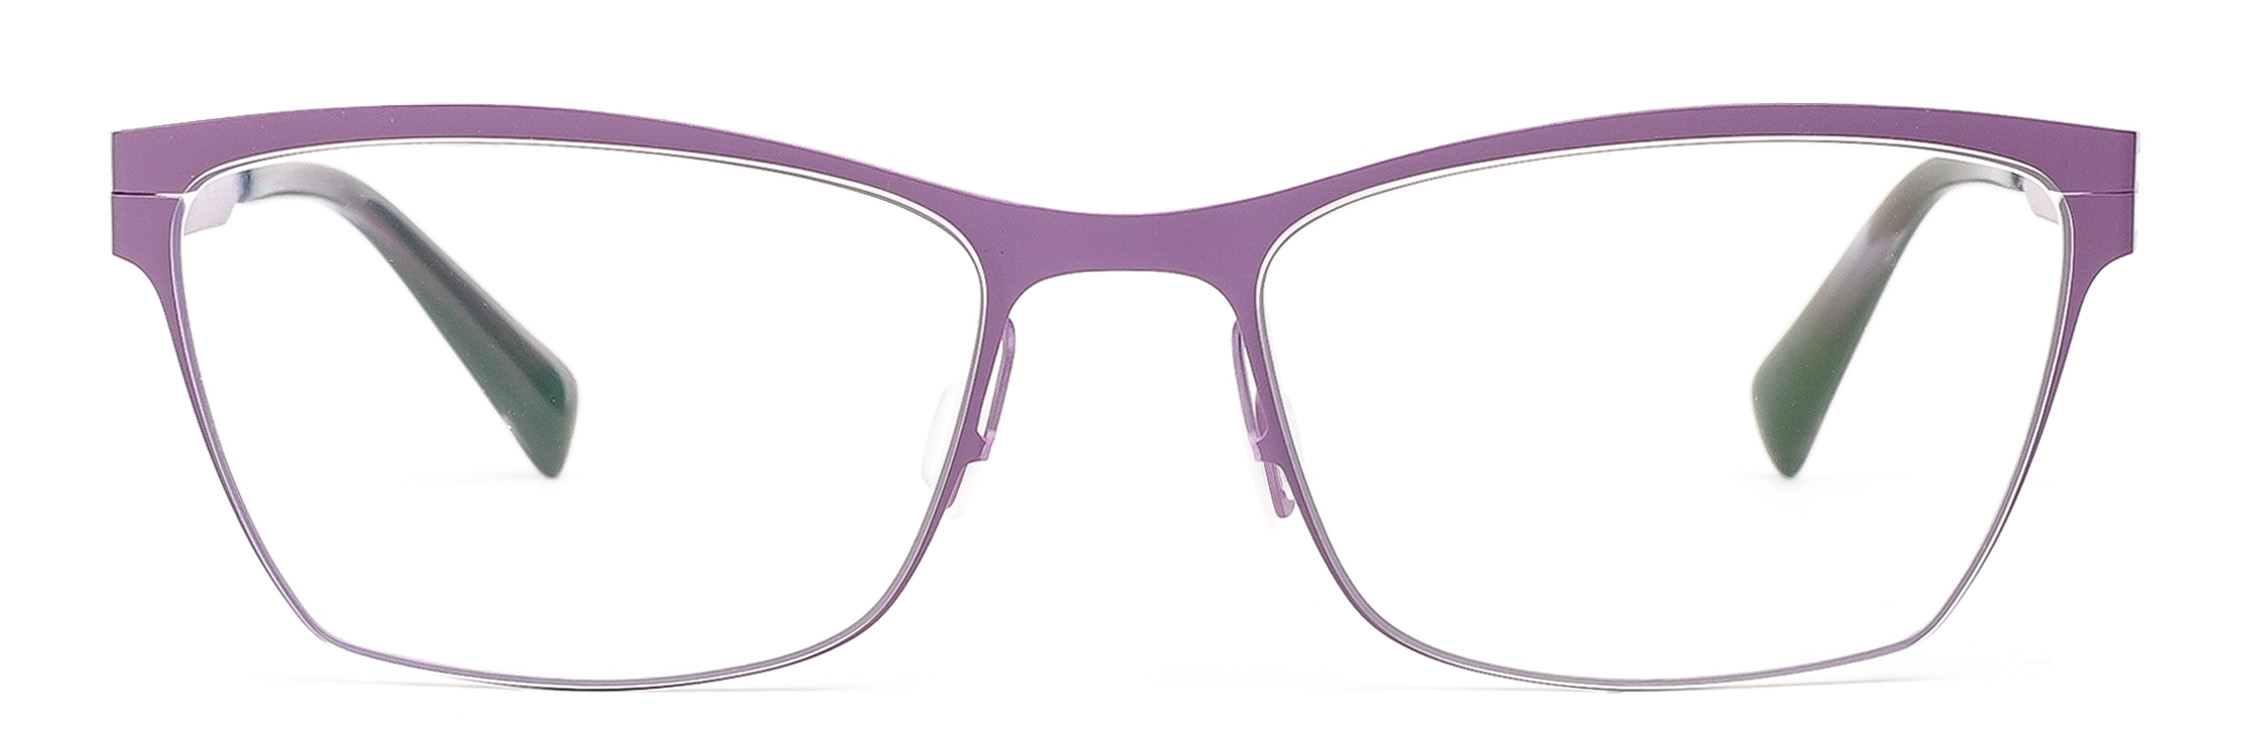 Grape/Violet